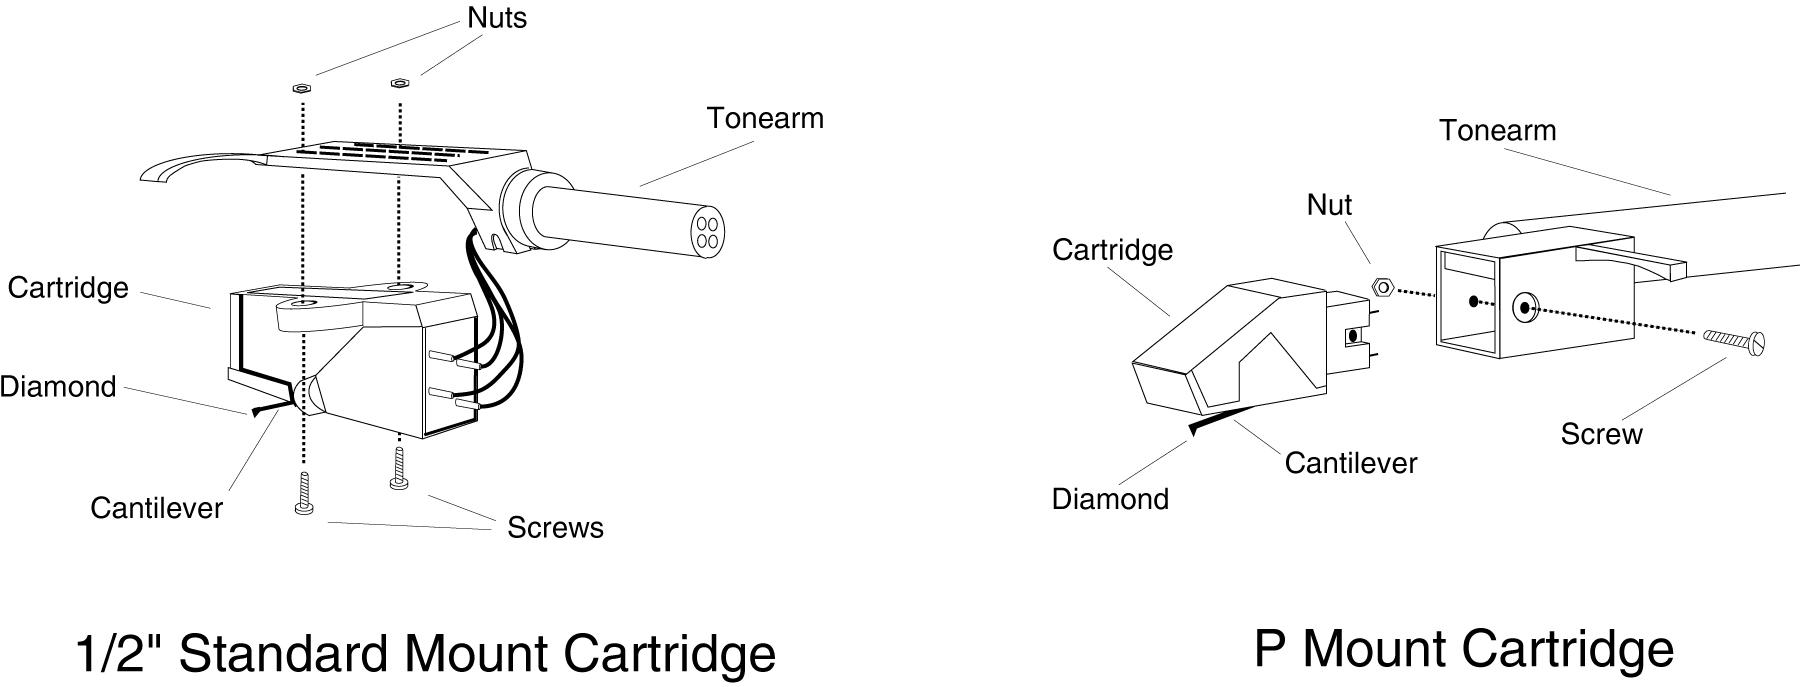 phono cartridge types large noob question denon sl 5as manual info vinyl engine Magnetic Cartridge Pre Amp at soozxer.org